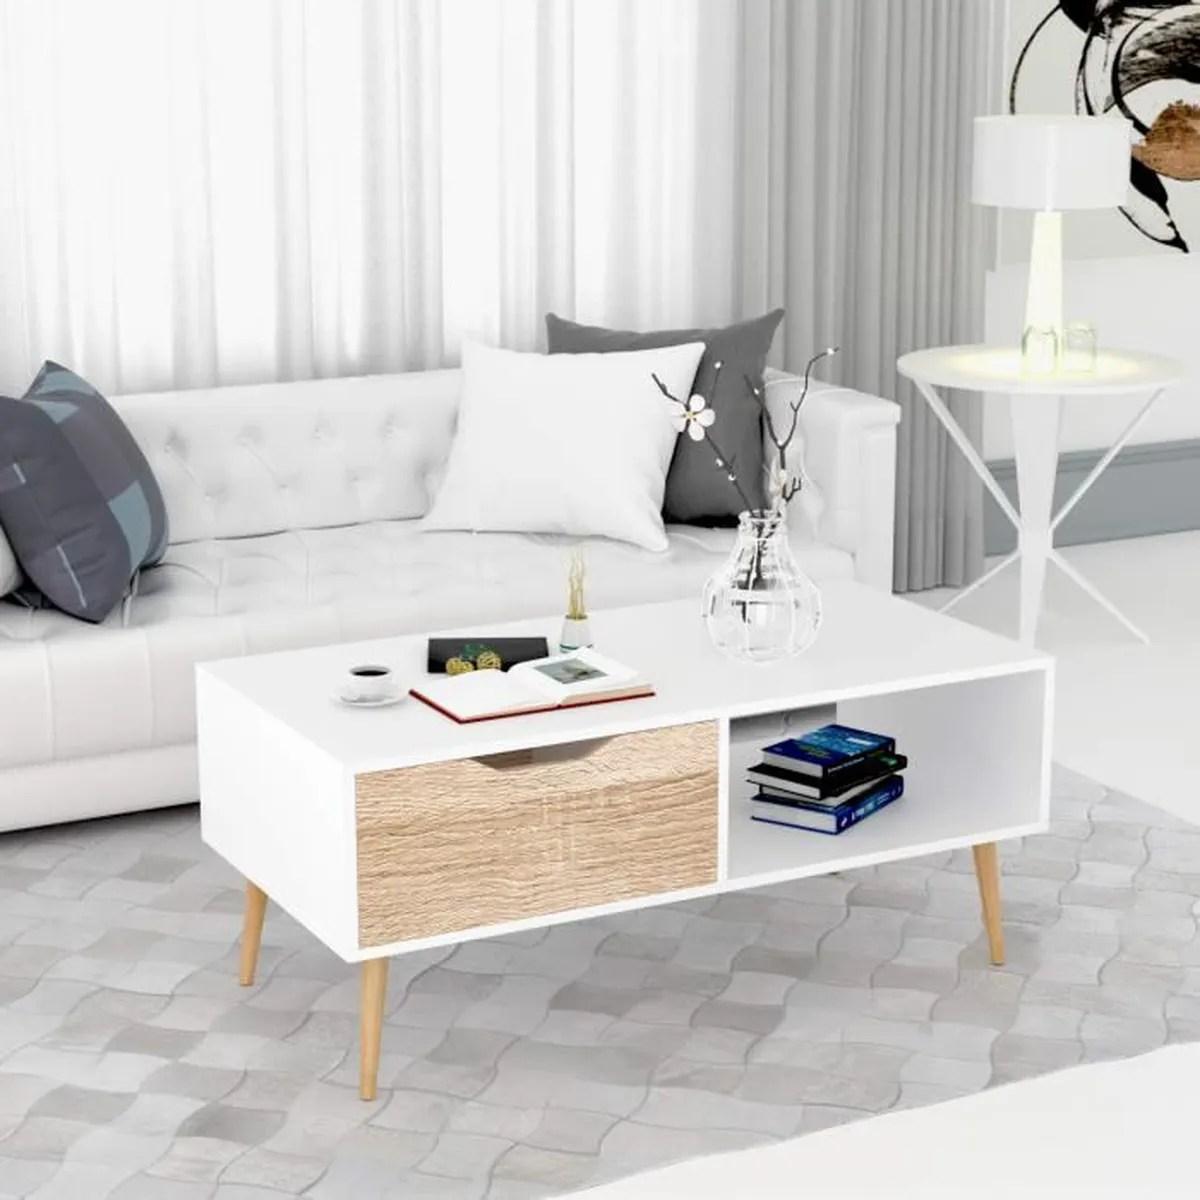 homfa table de salon scandinave table